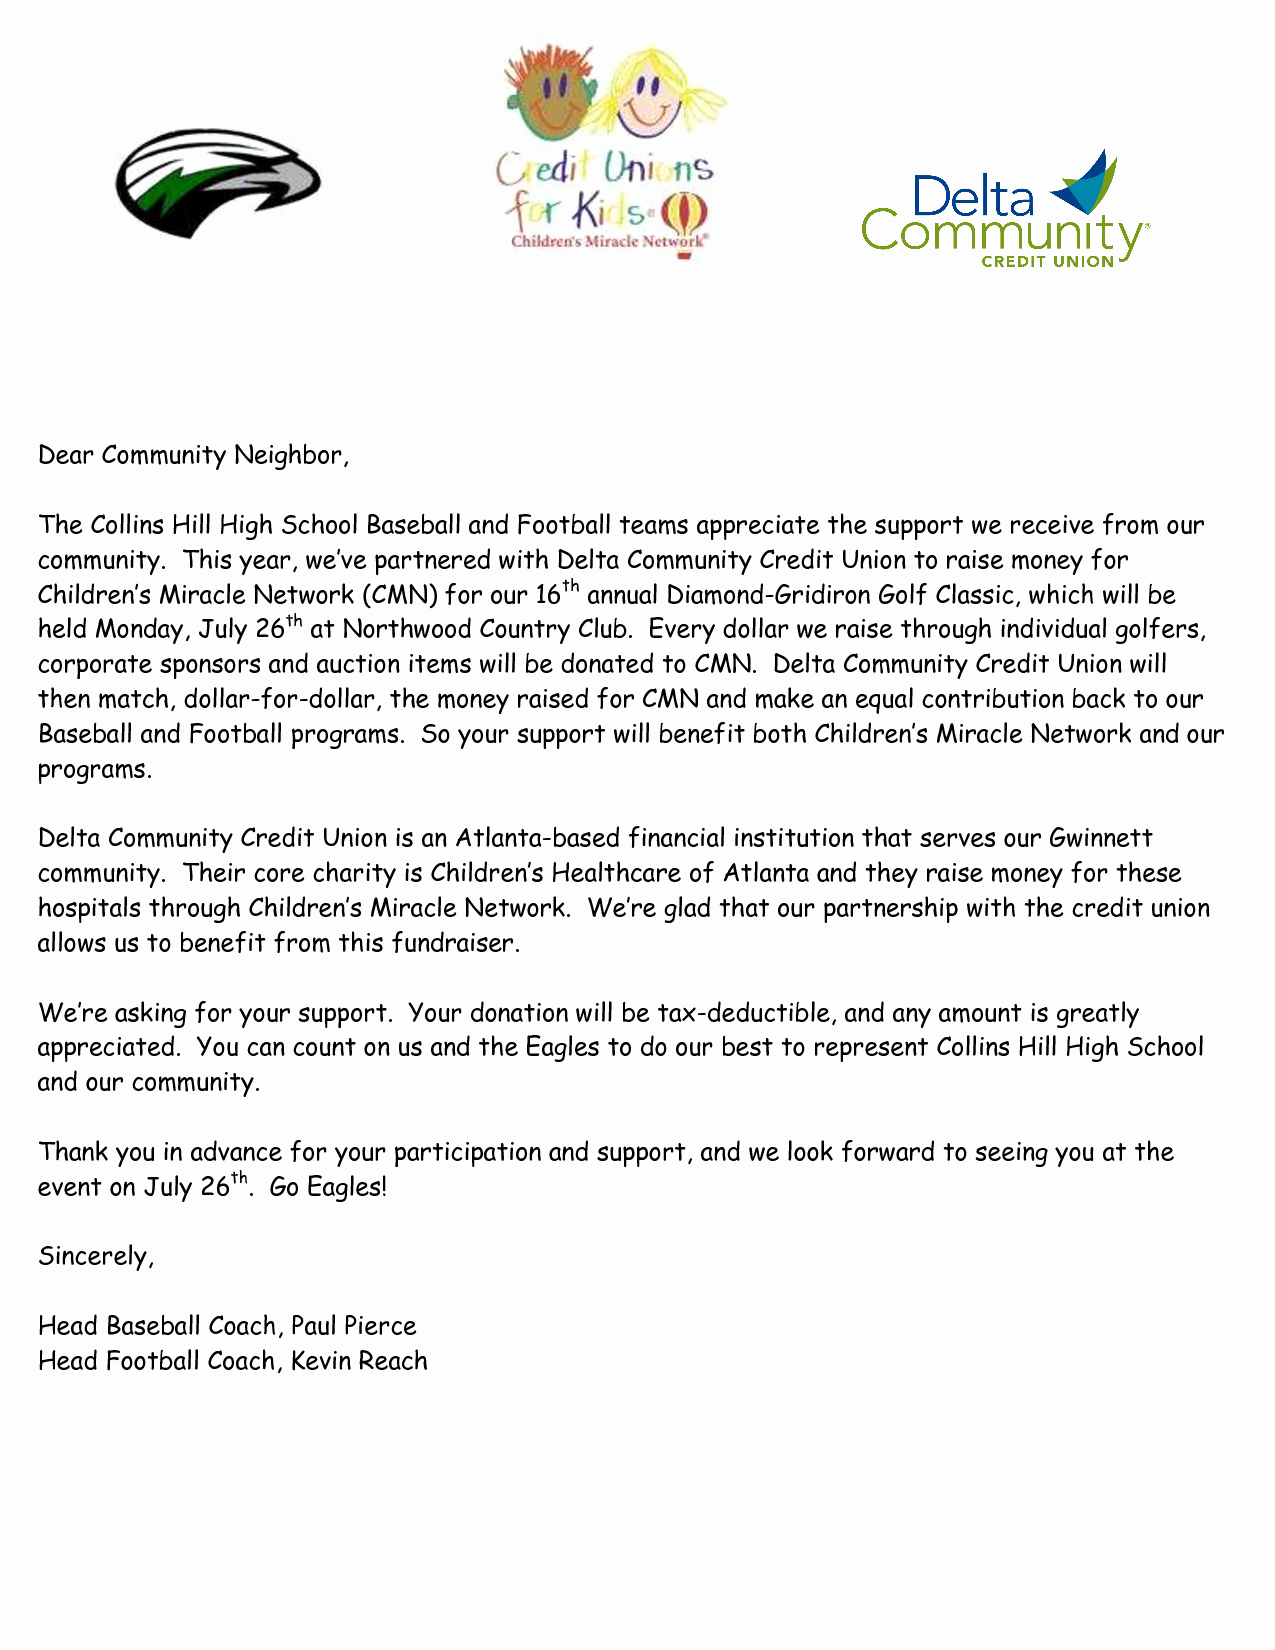 Golf tournament Sponsorship Letter Template - Fundraising Sponsorship form Template Awesome Best S Sponsorship